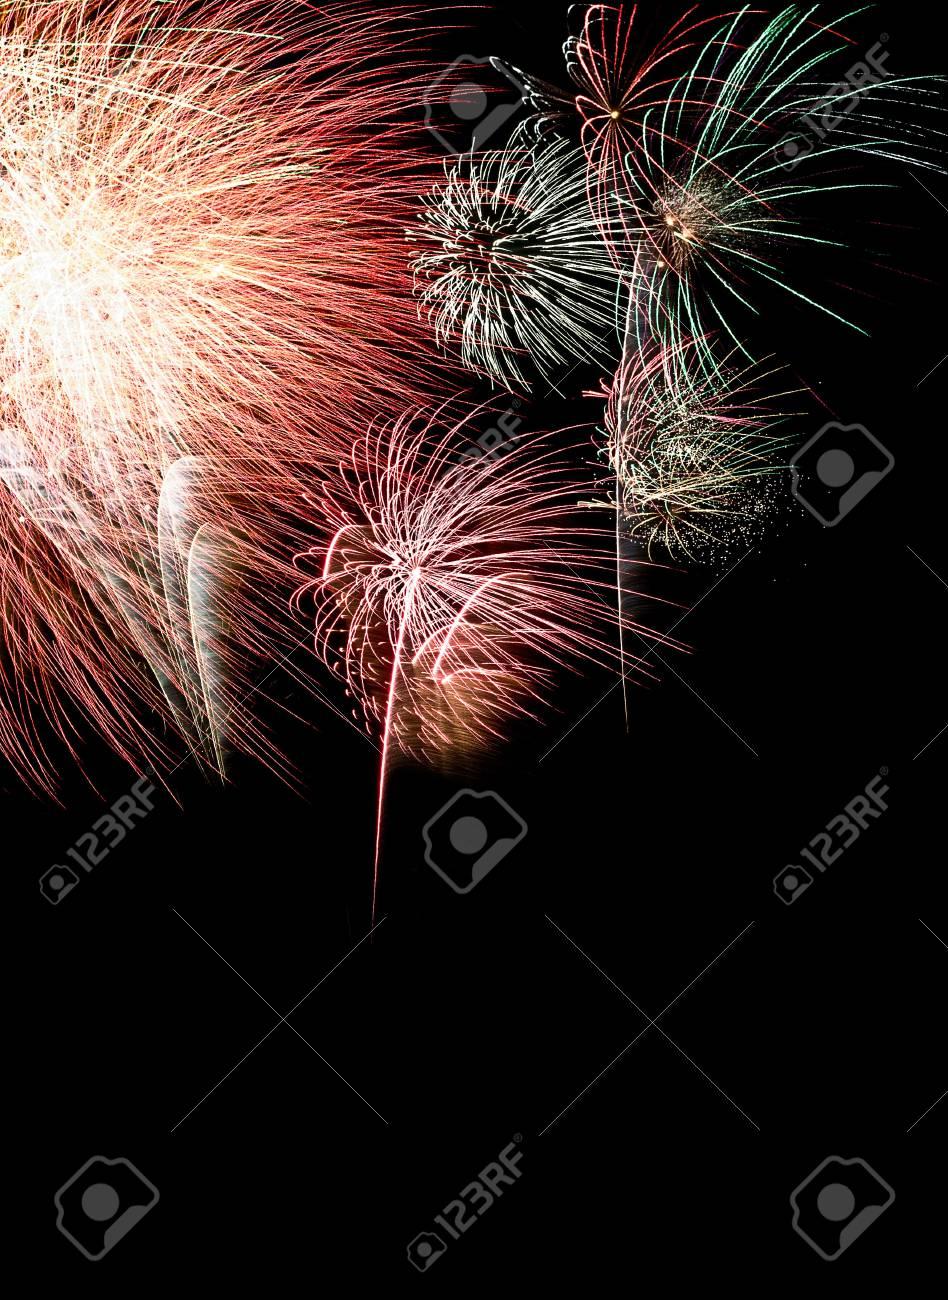 Fireworks display Stock Photo - 8095326